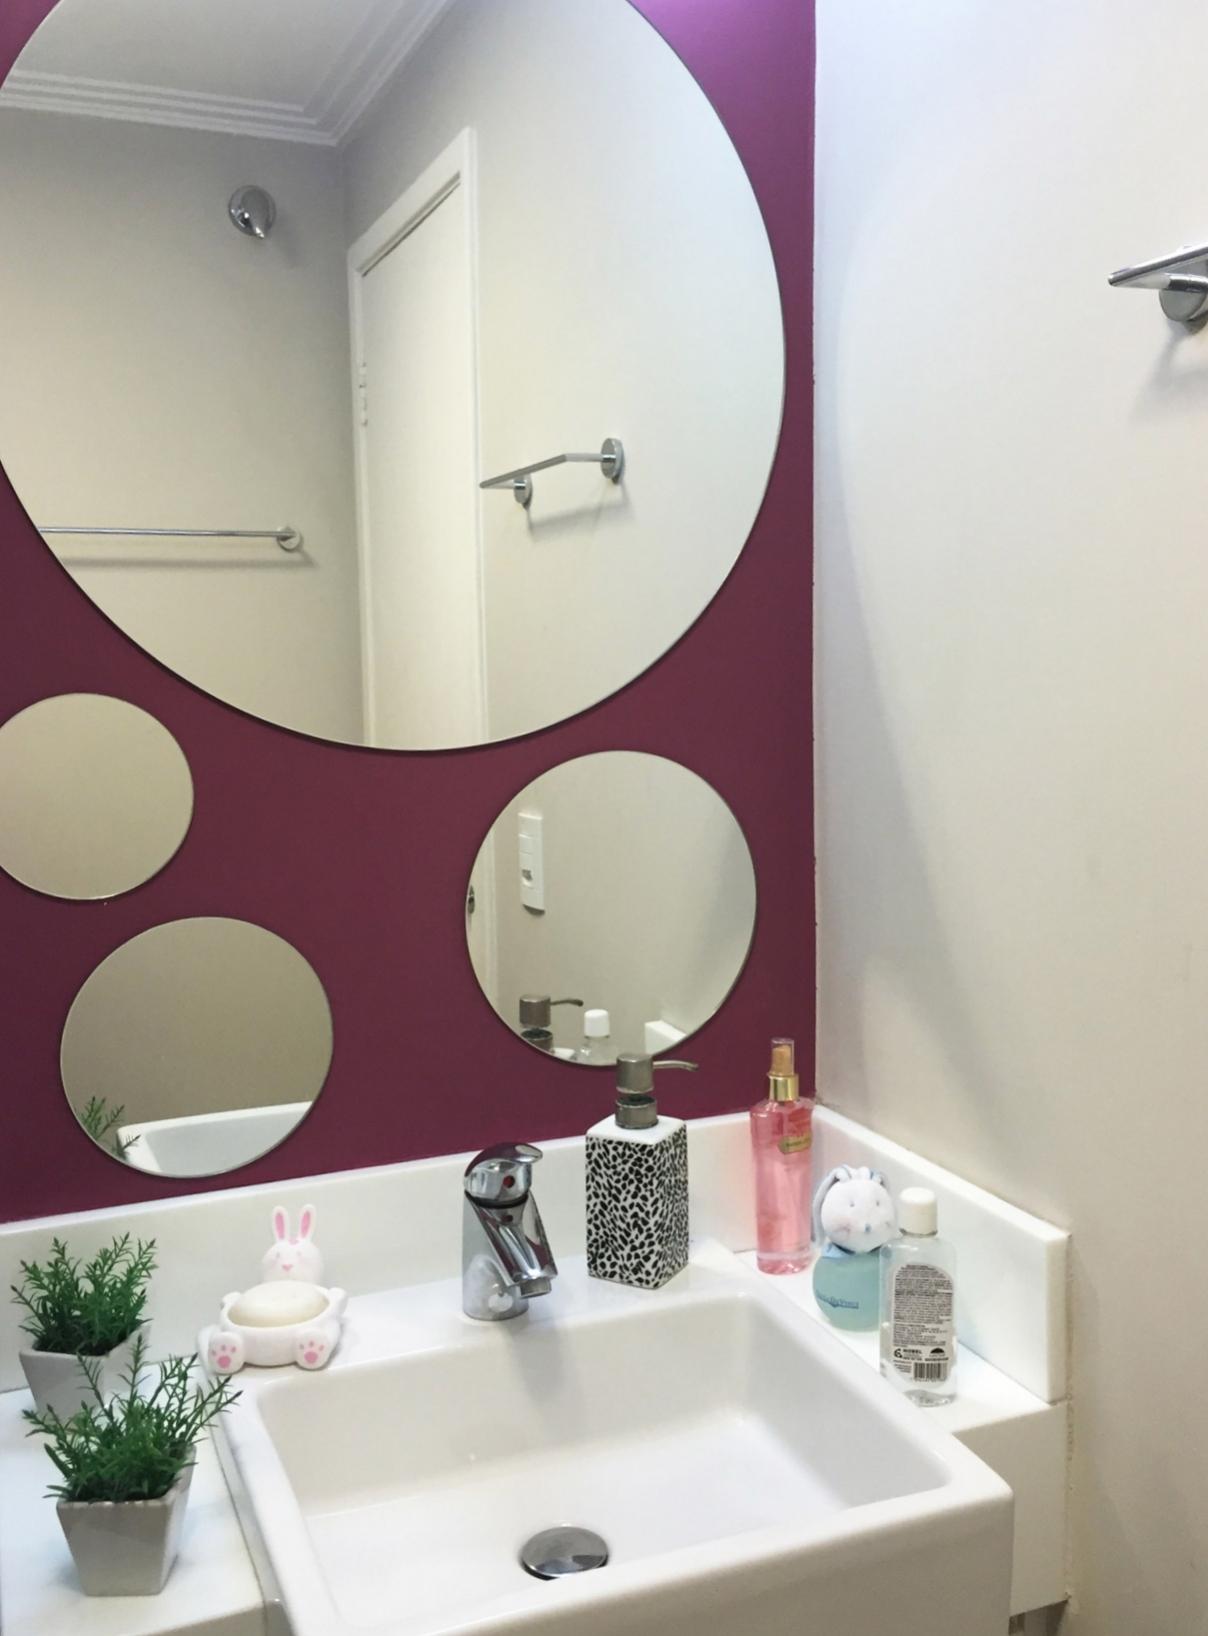 Daniela-Marques-Arquitetura-006-Banheiro-Lavabo-Espelho-Redondo.jpg